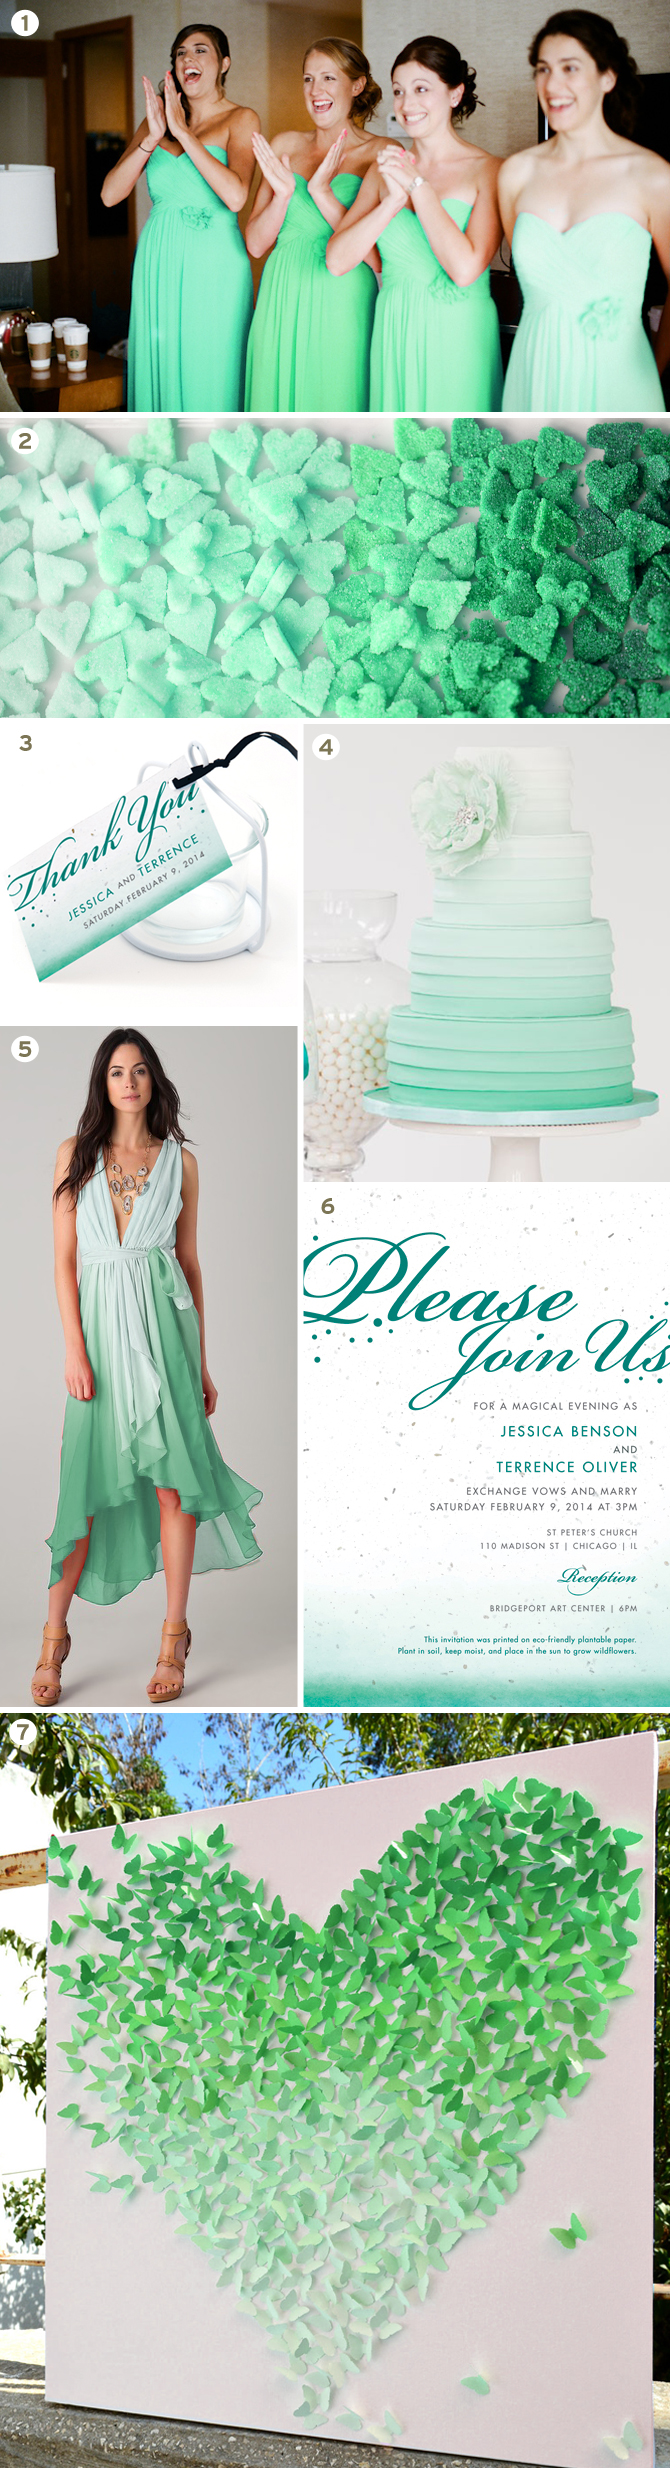 Botanical PaperWorks Inspiration Board: Ombre Wedding